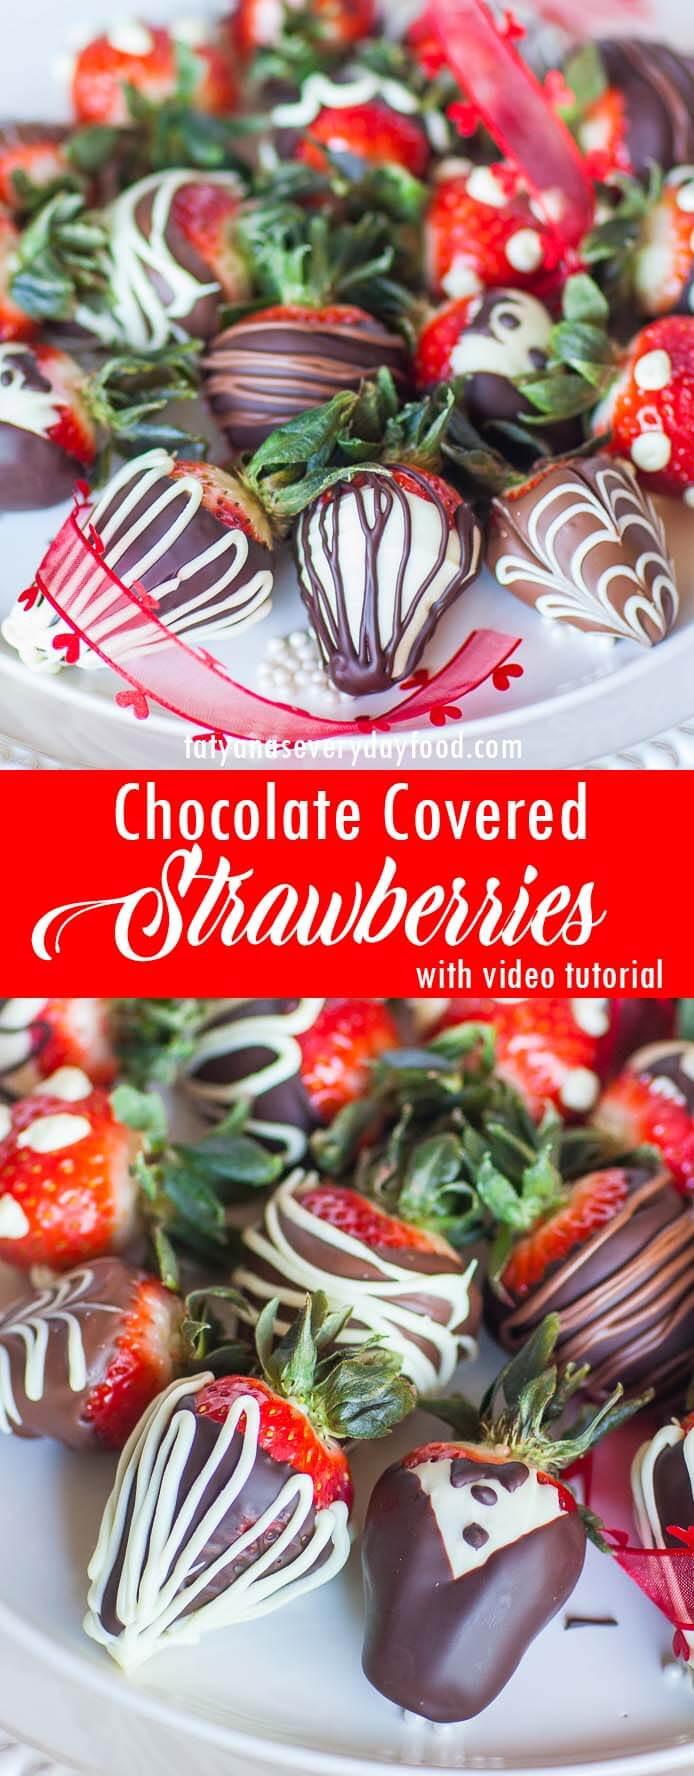 Chocolate Covered Strawberries video tutorial